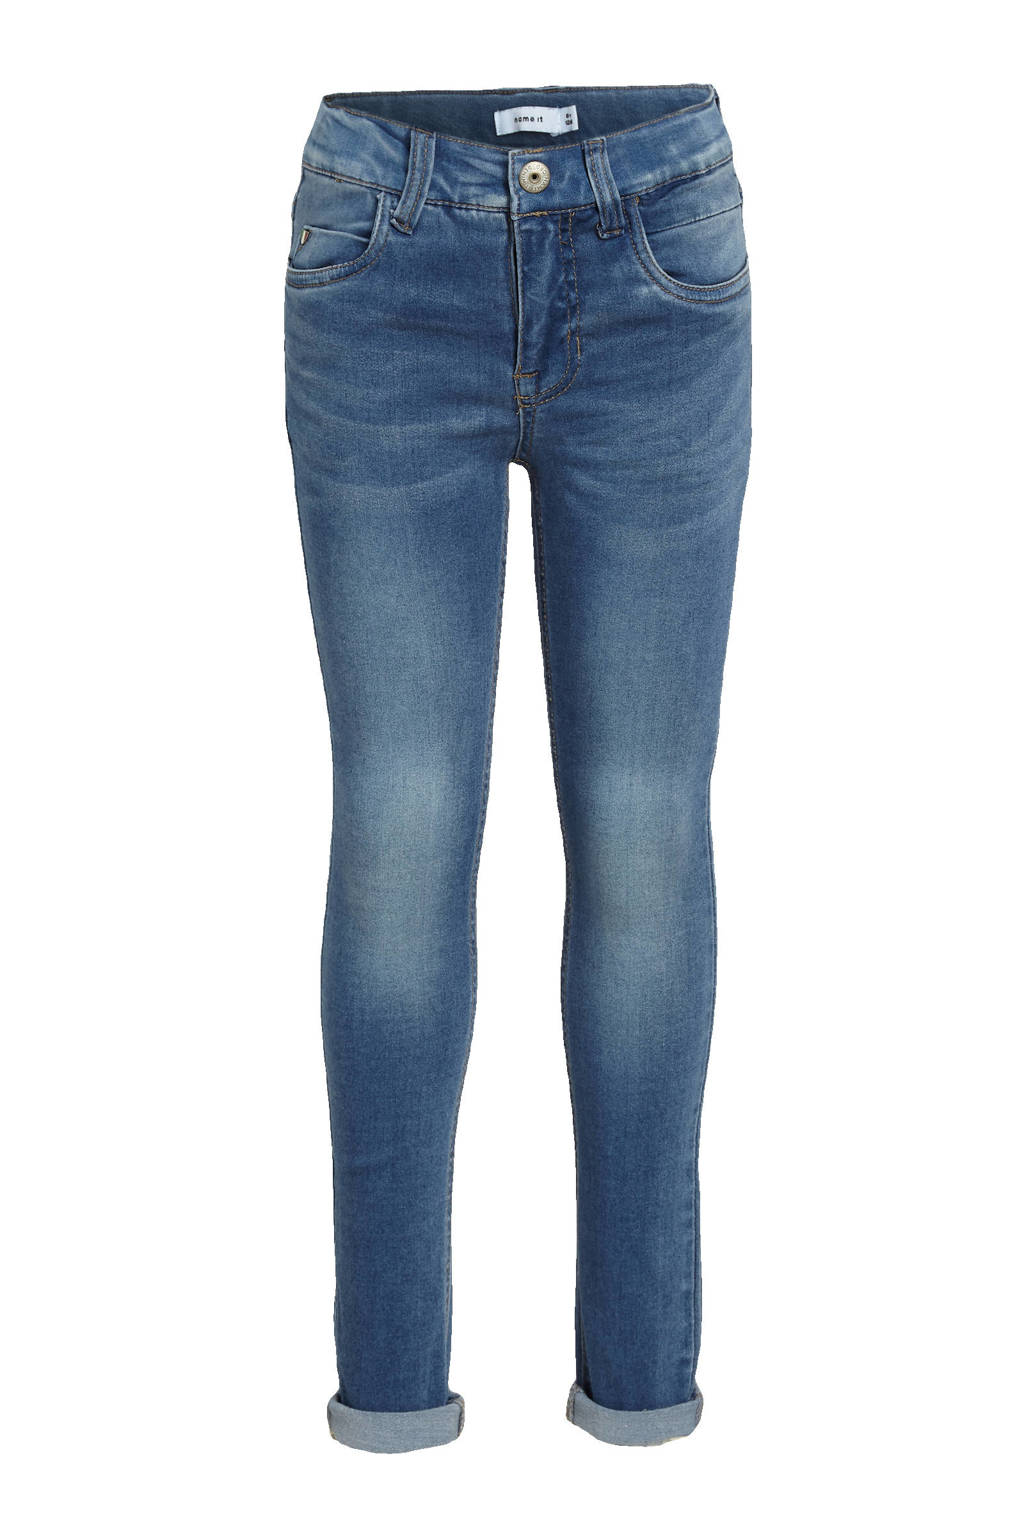 NAME IT KIDS slim fit jeans Theo stonewashed, Stonewashed